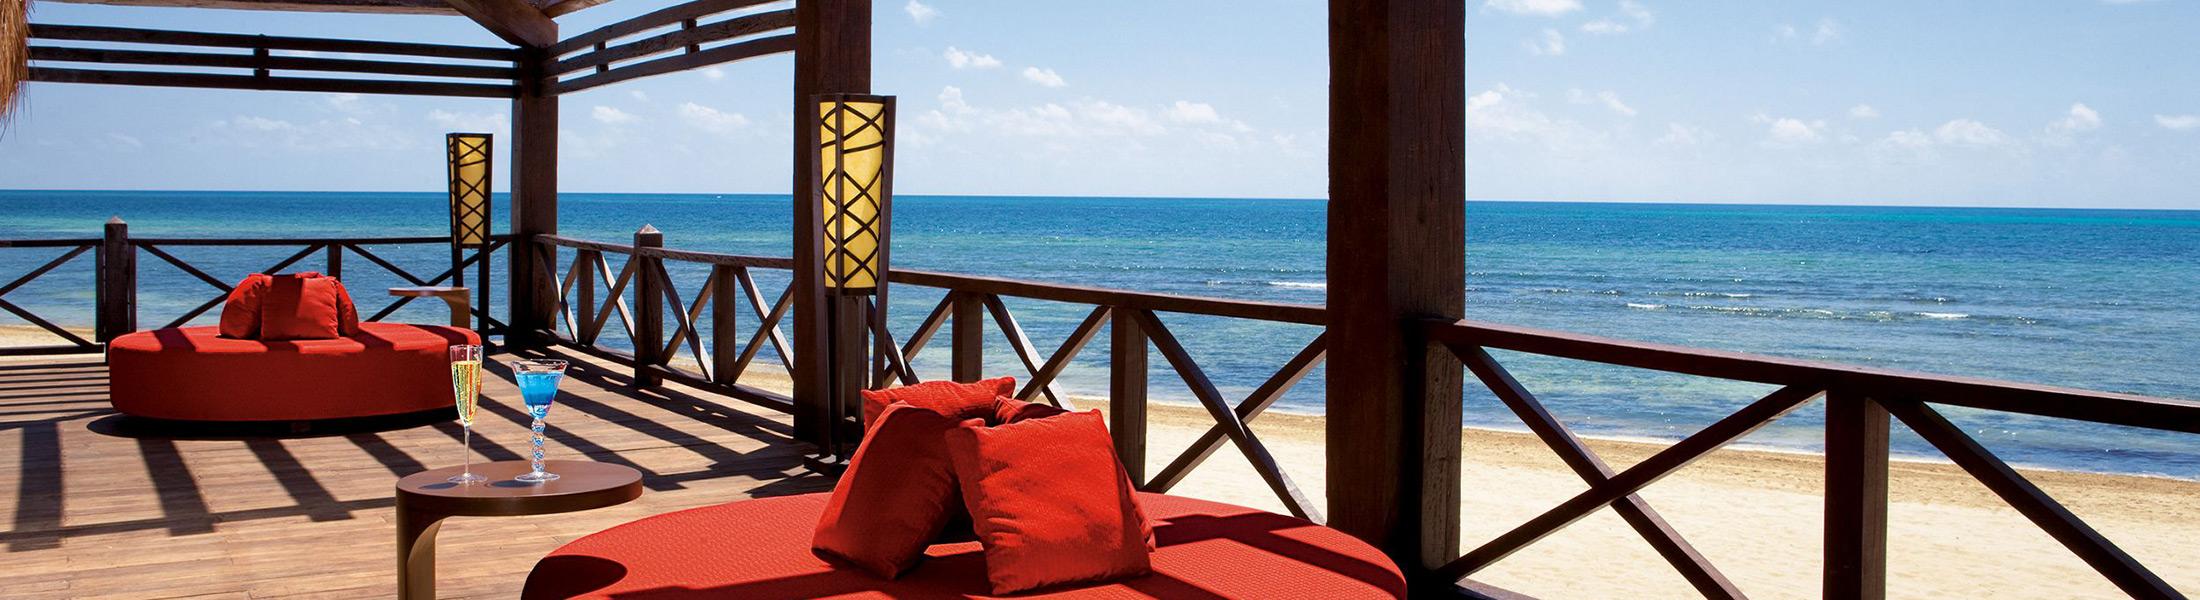 Barracuda bar overlooking the ocean at Secrets Silversands Riviera